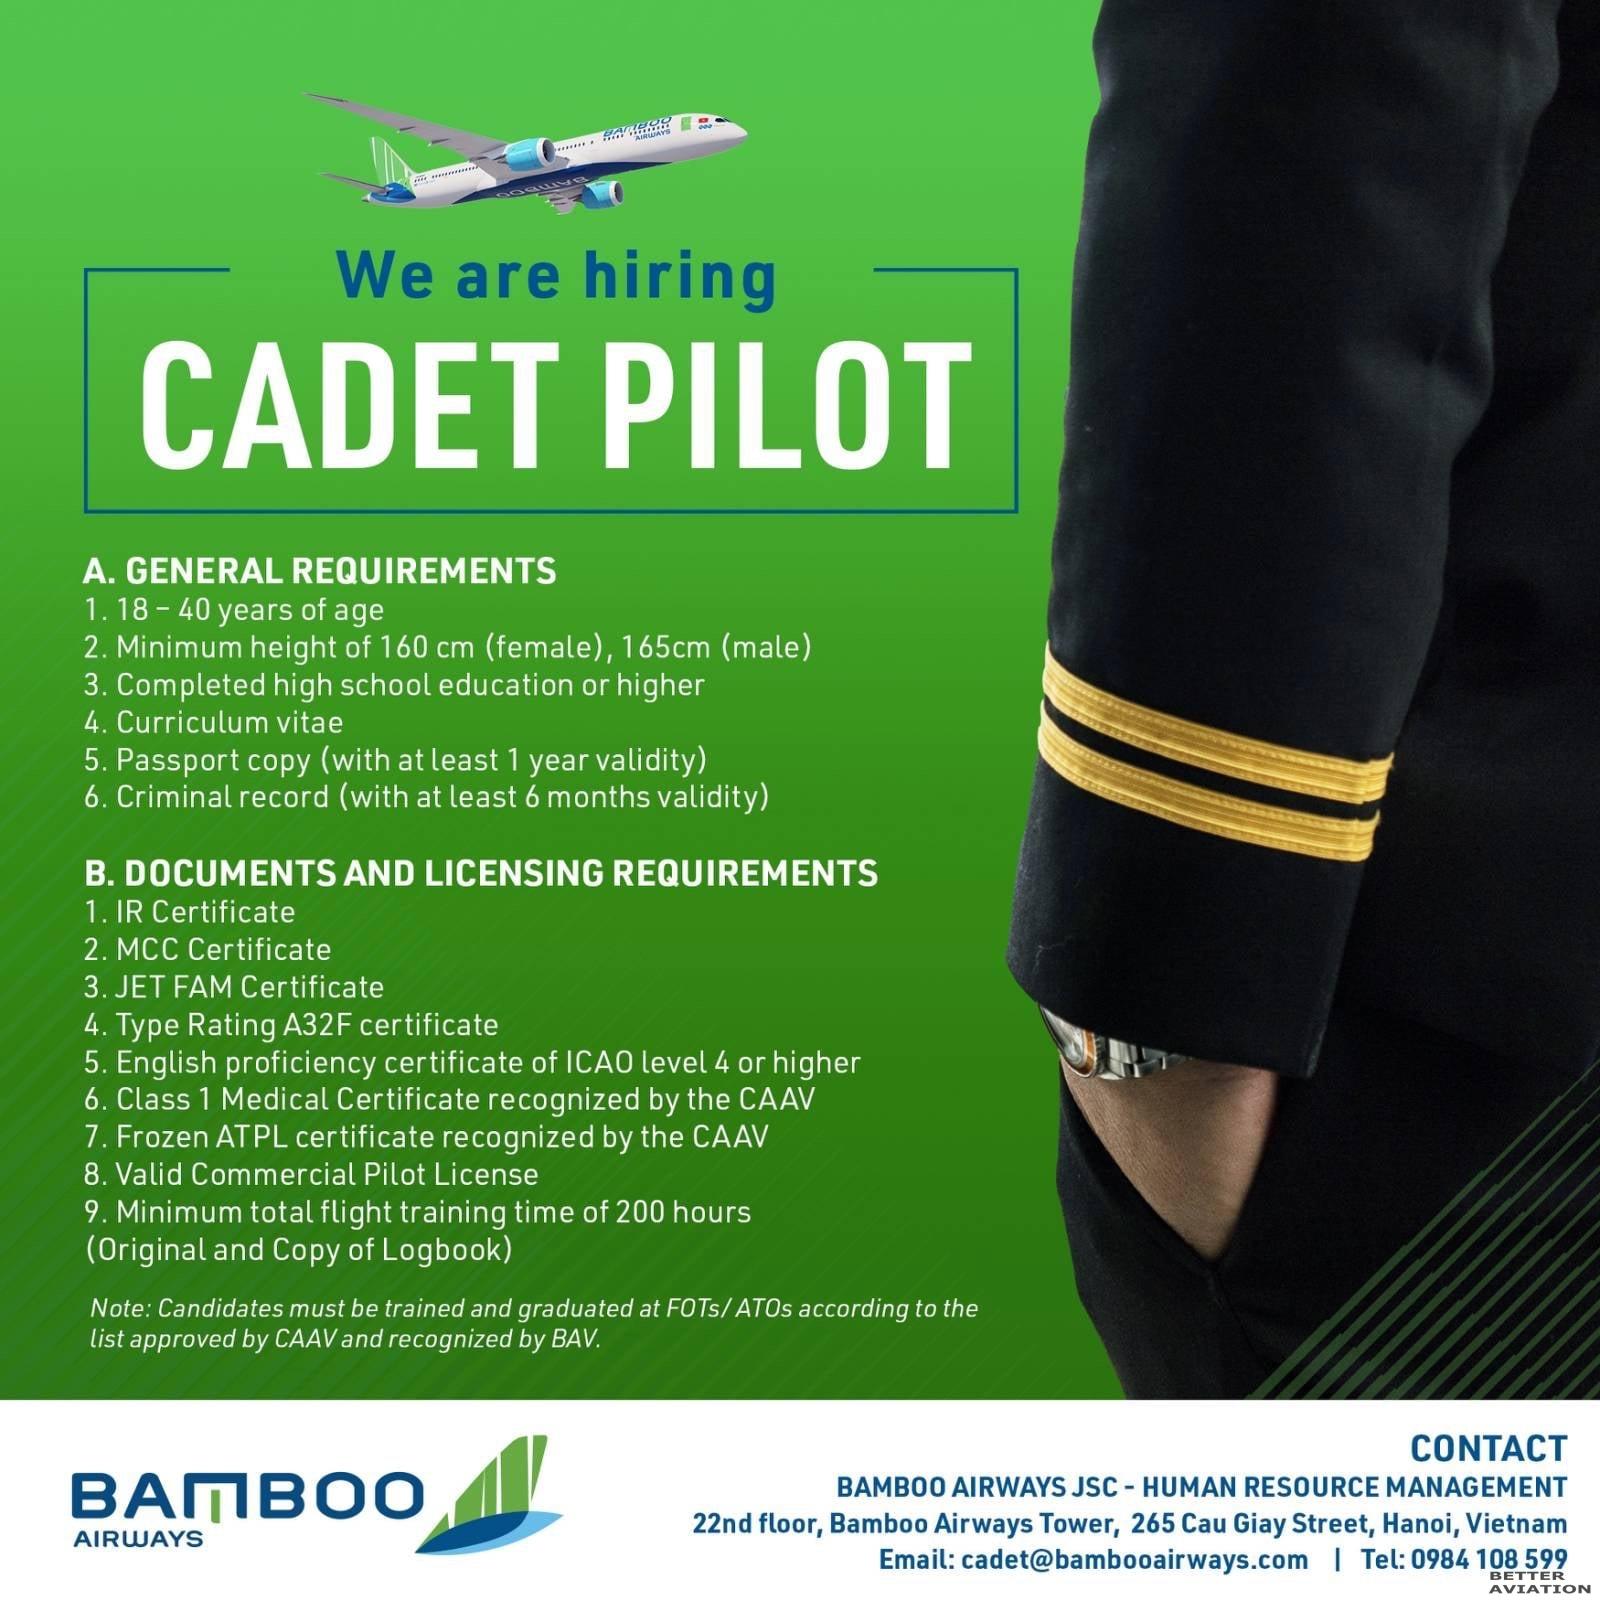 Bamboo Airways Cadet Pilot.